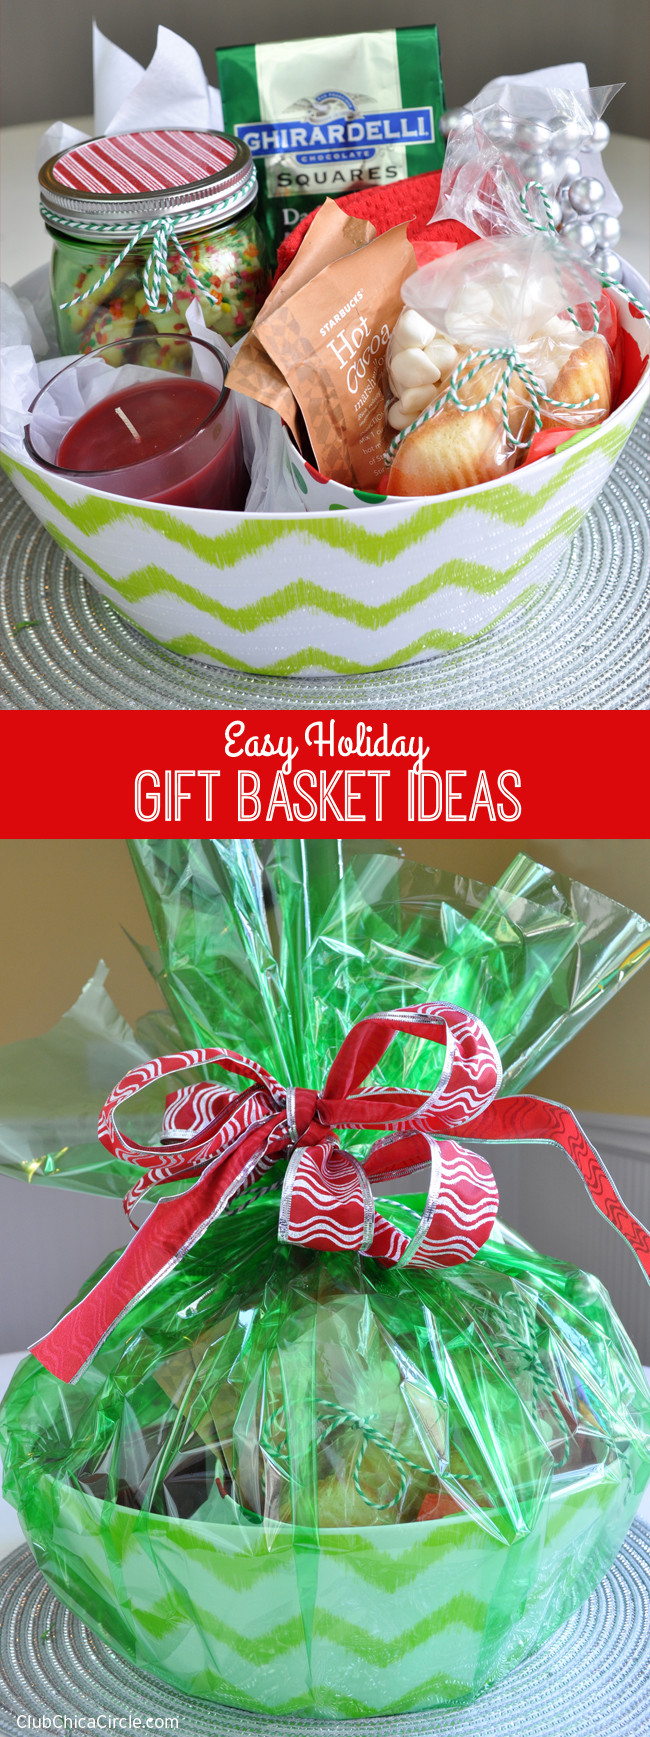 Christmas Basket DIY  Easy Holiday Gift Basket Ideas Giveaway